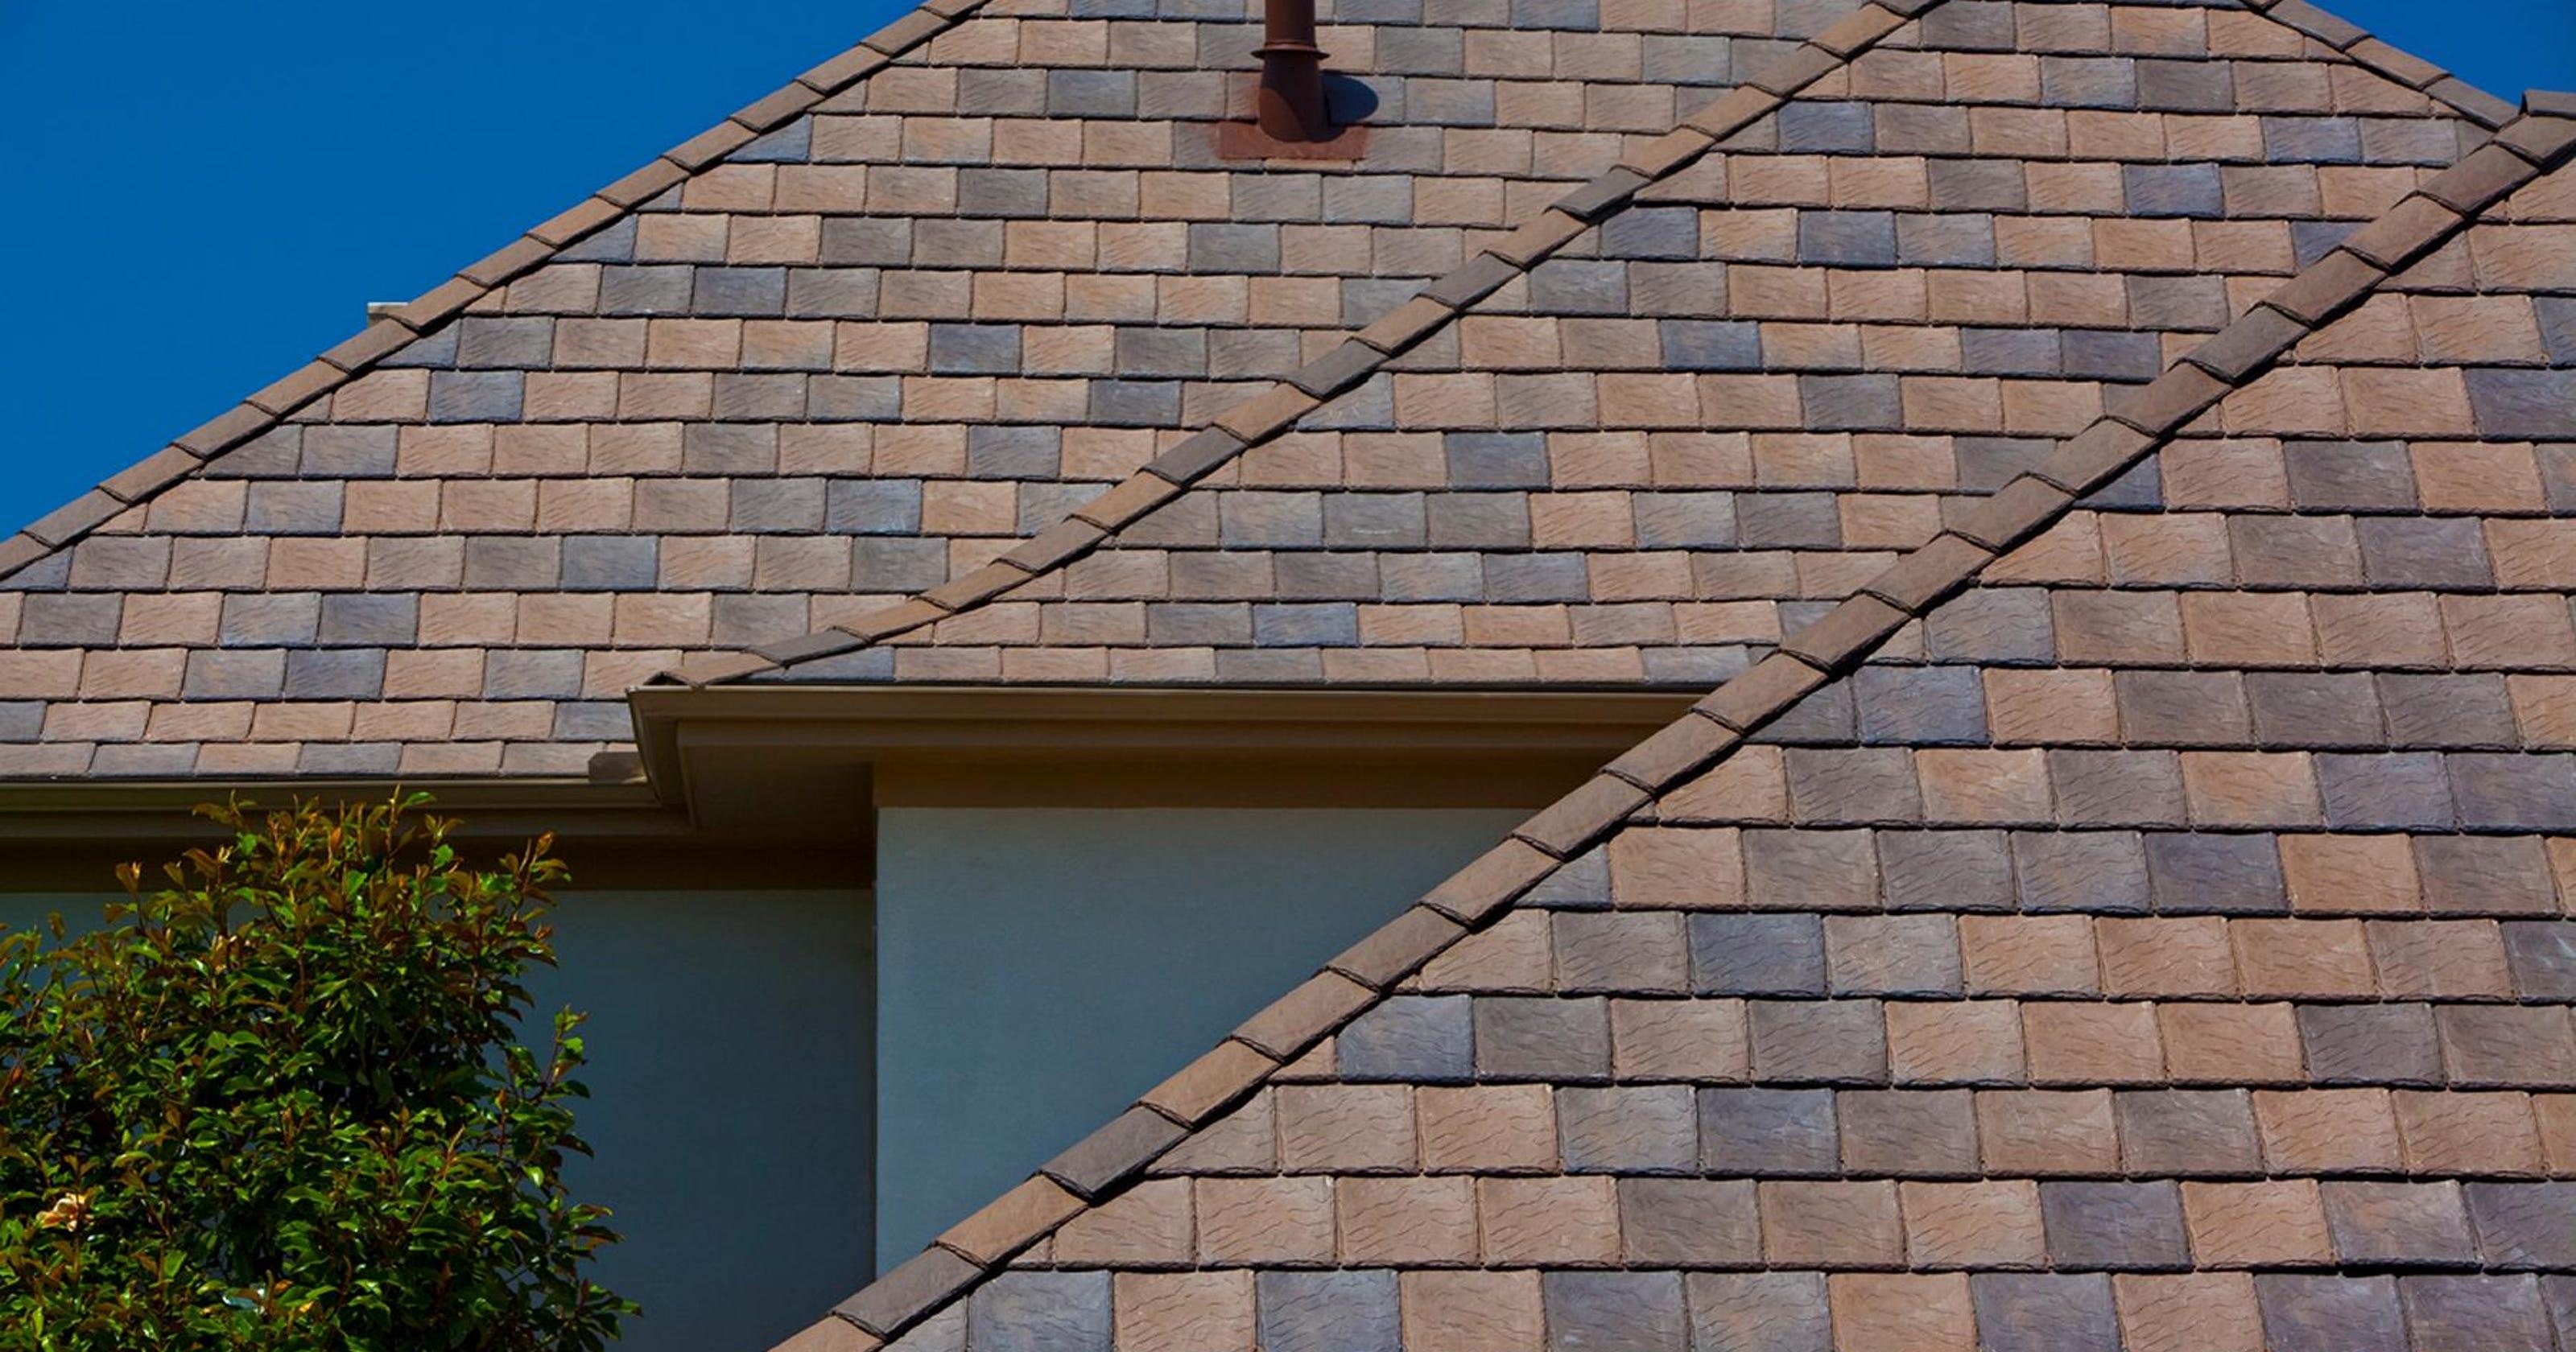 Handyman More Than Asphalt Roofing Shingles